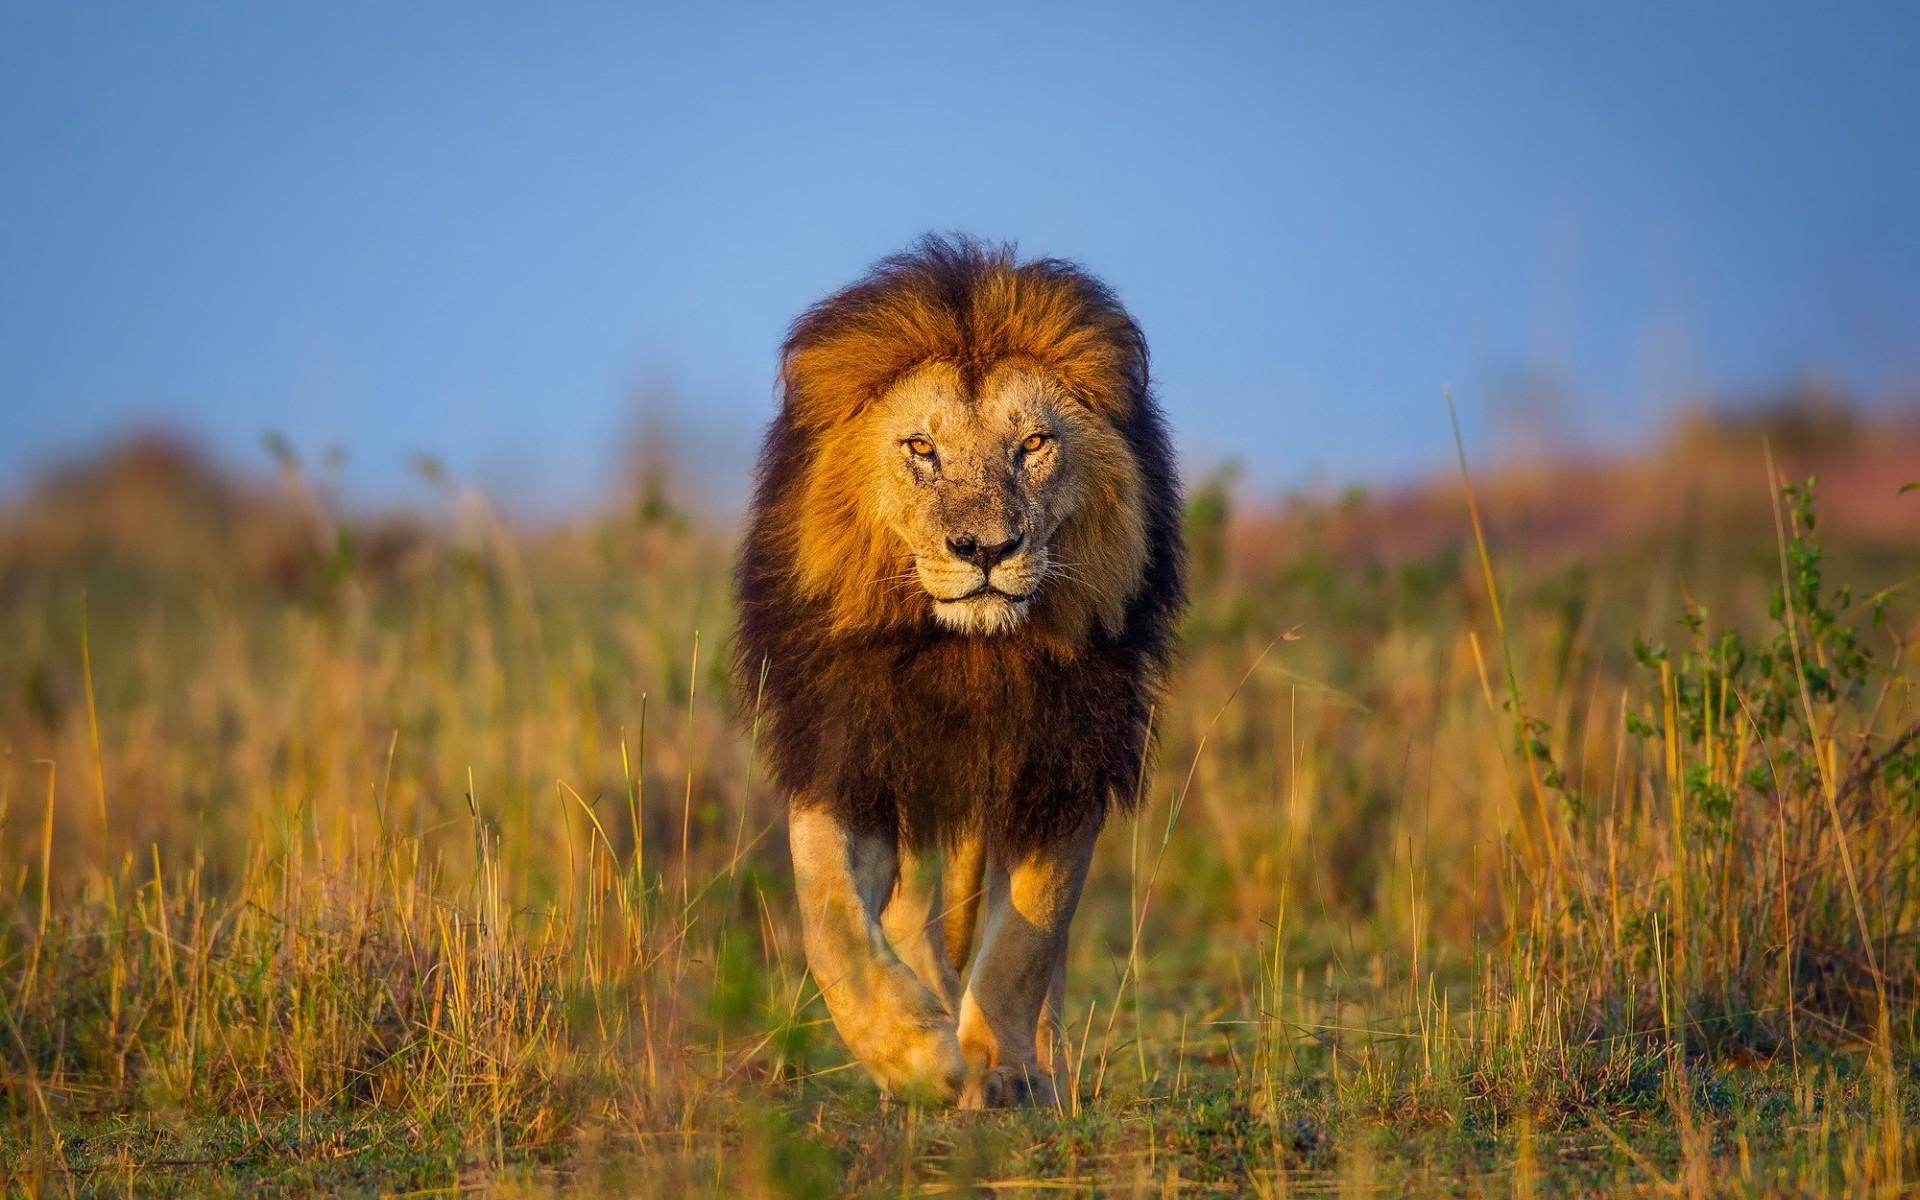 8k Animal Wallpaper Download: Male Lion Faces Wallpaper ·① WallpaperTag